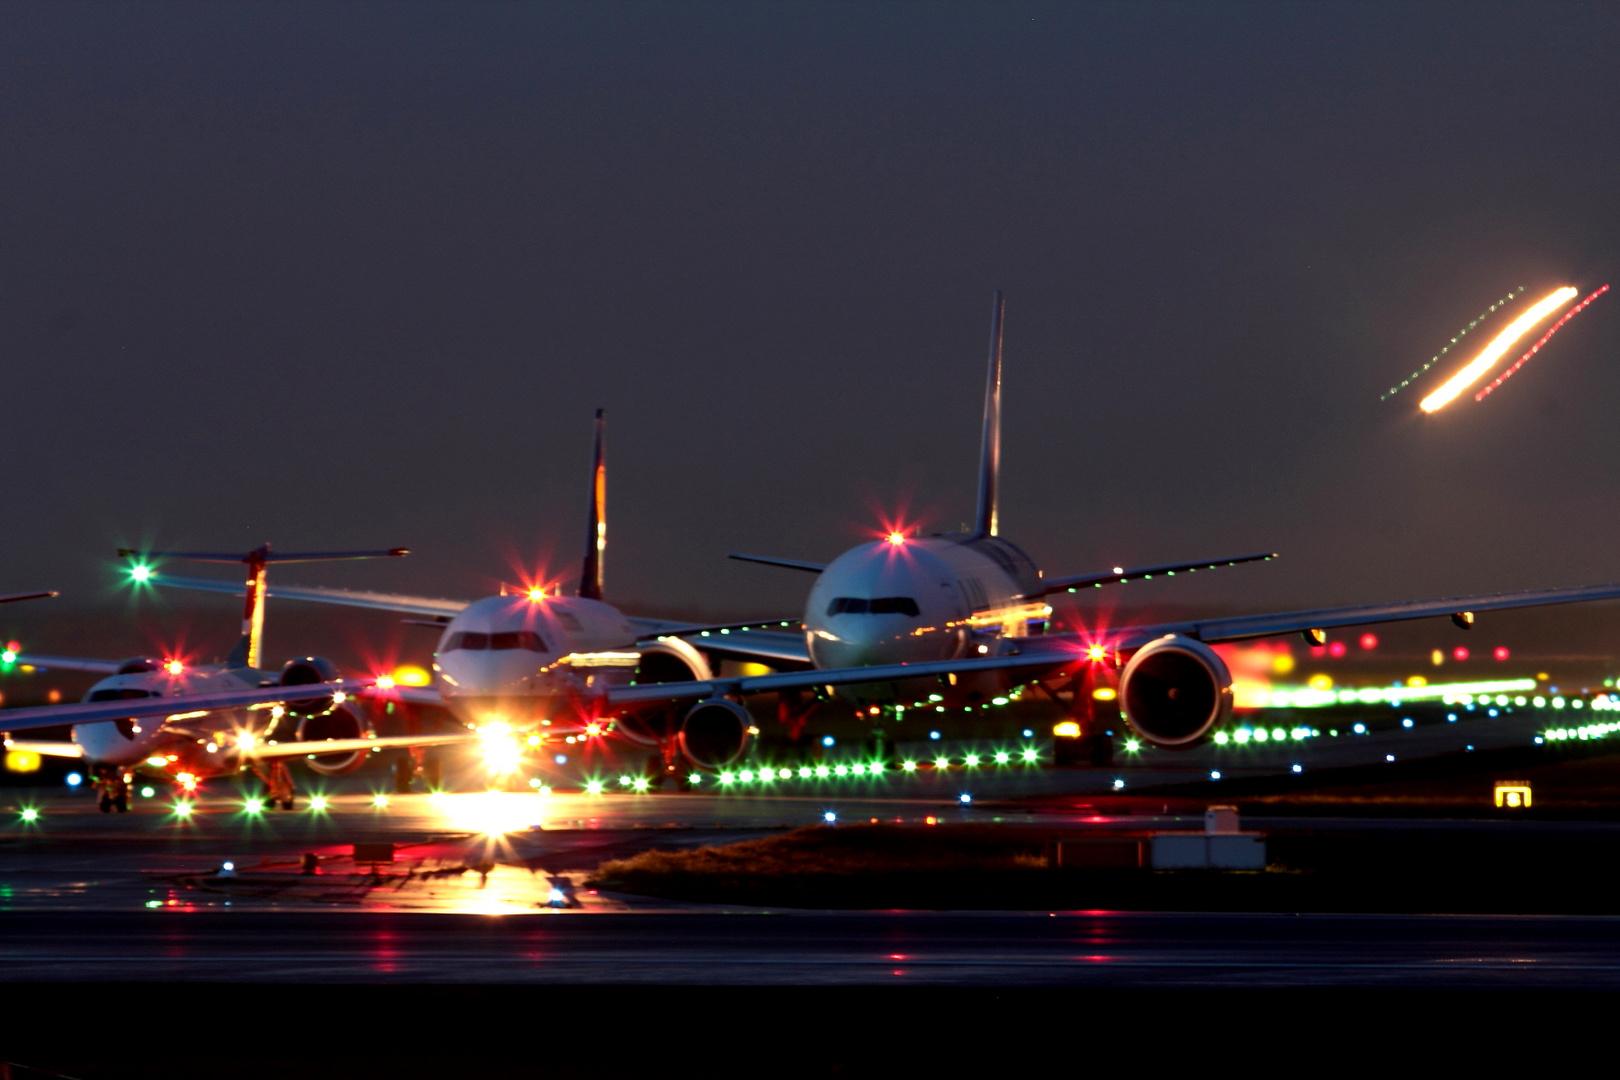 FRAport Nightshot